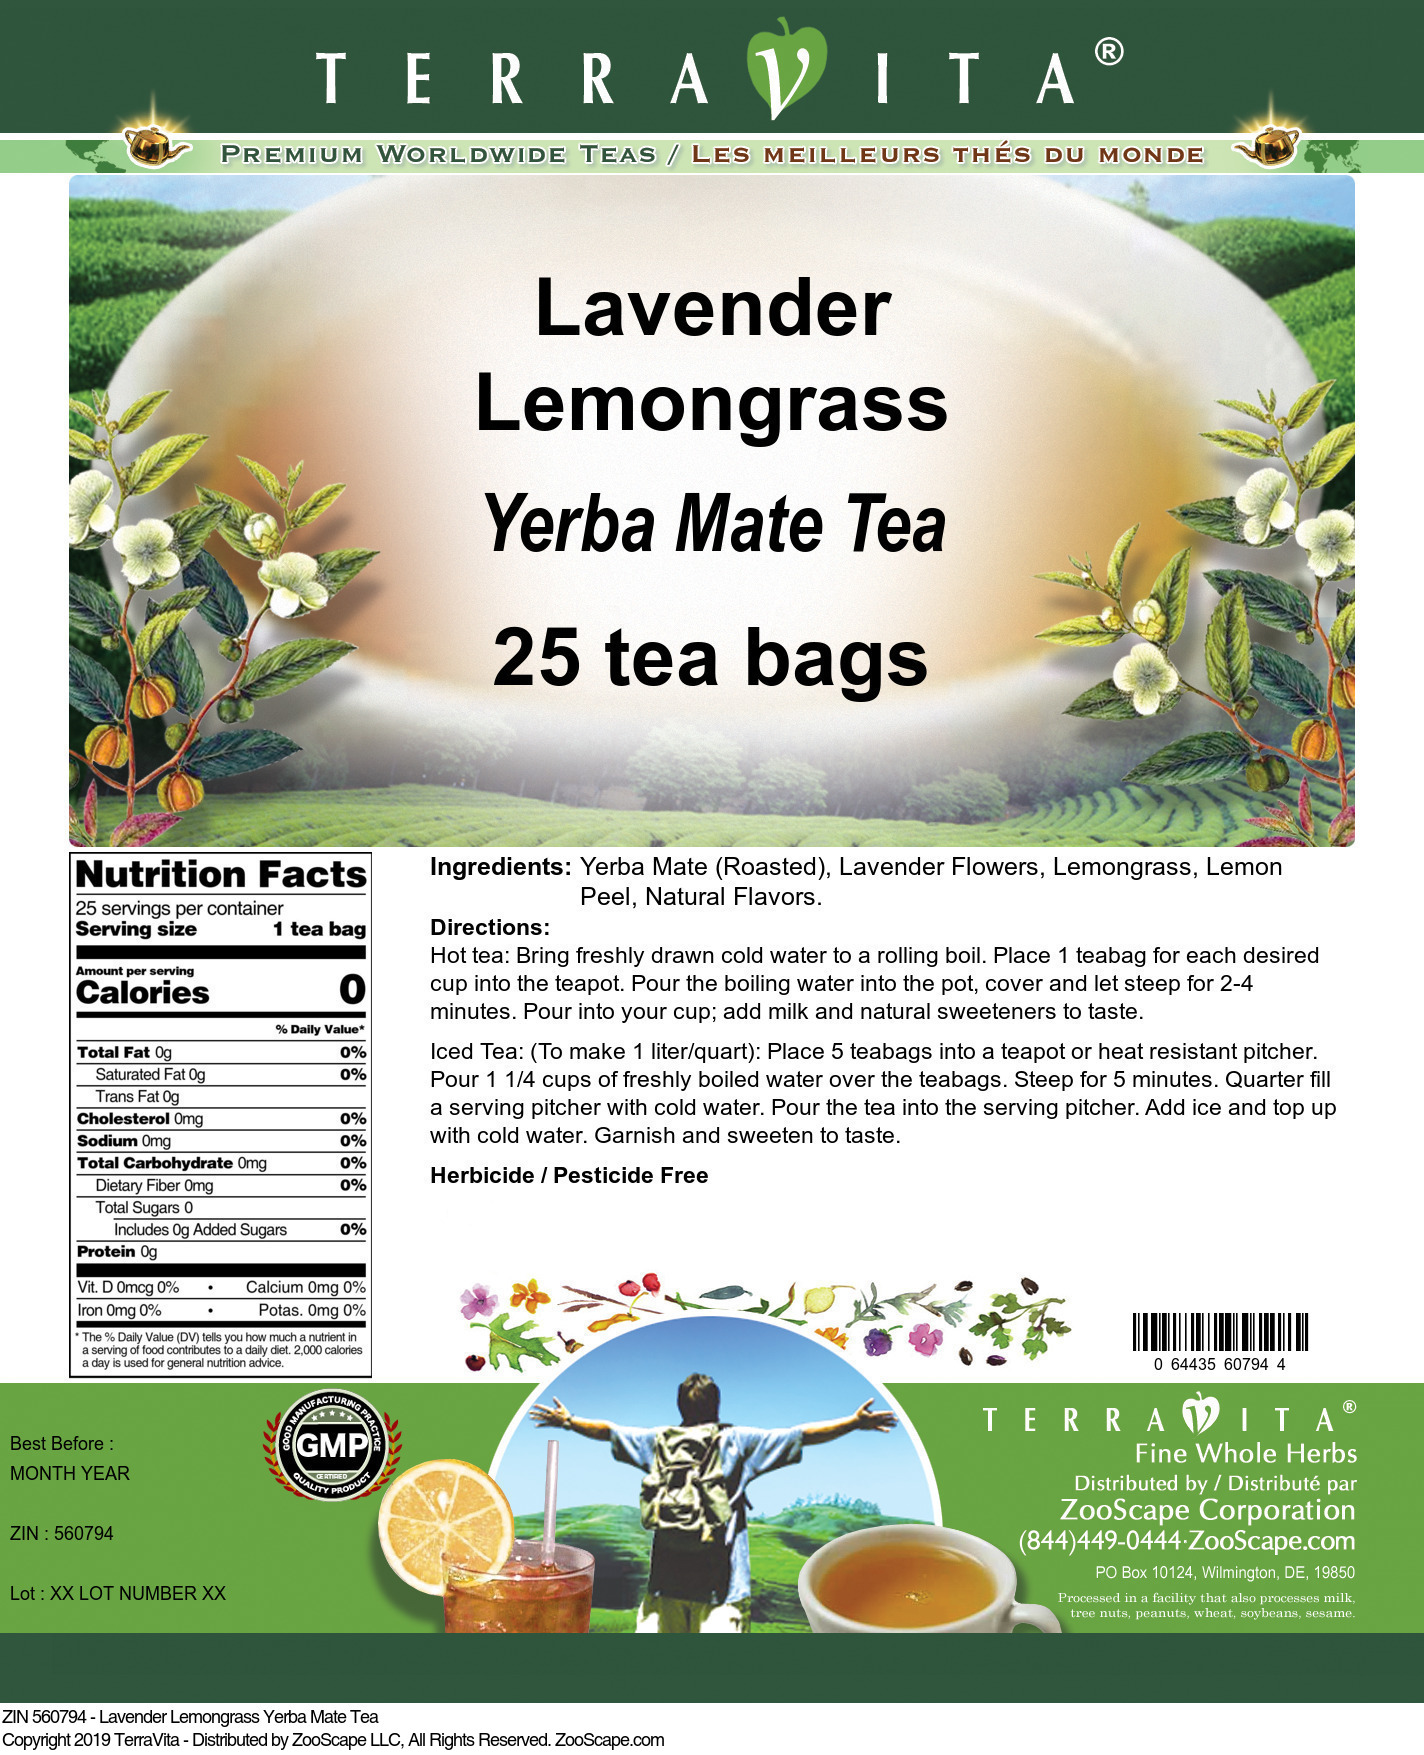 Lavender Lemongrass Yerba Mate